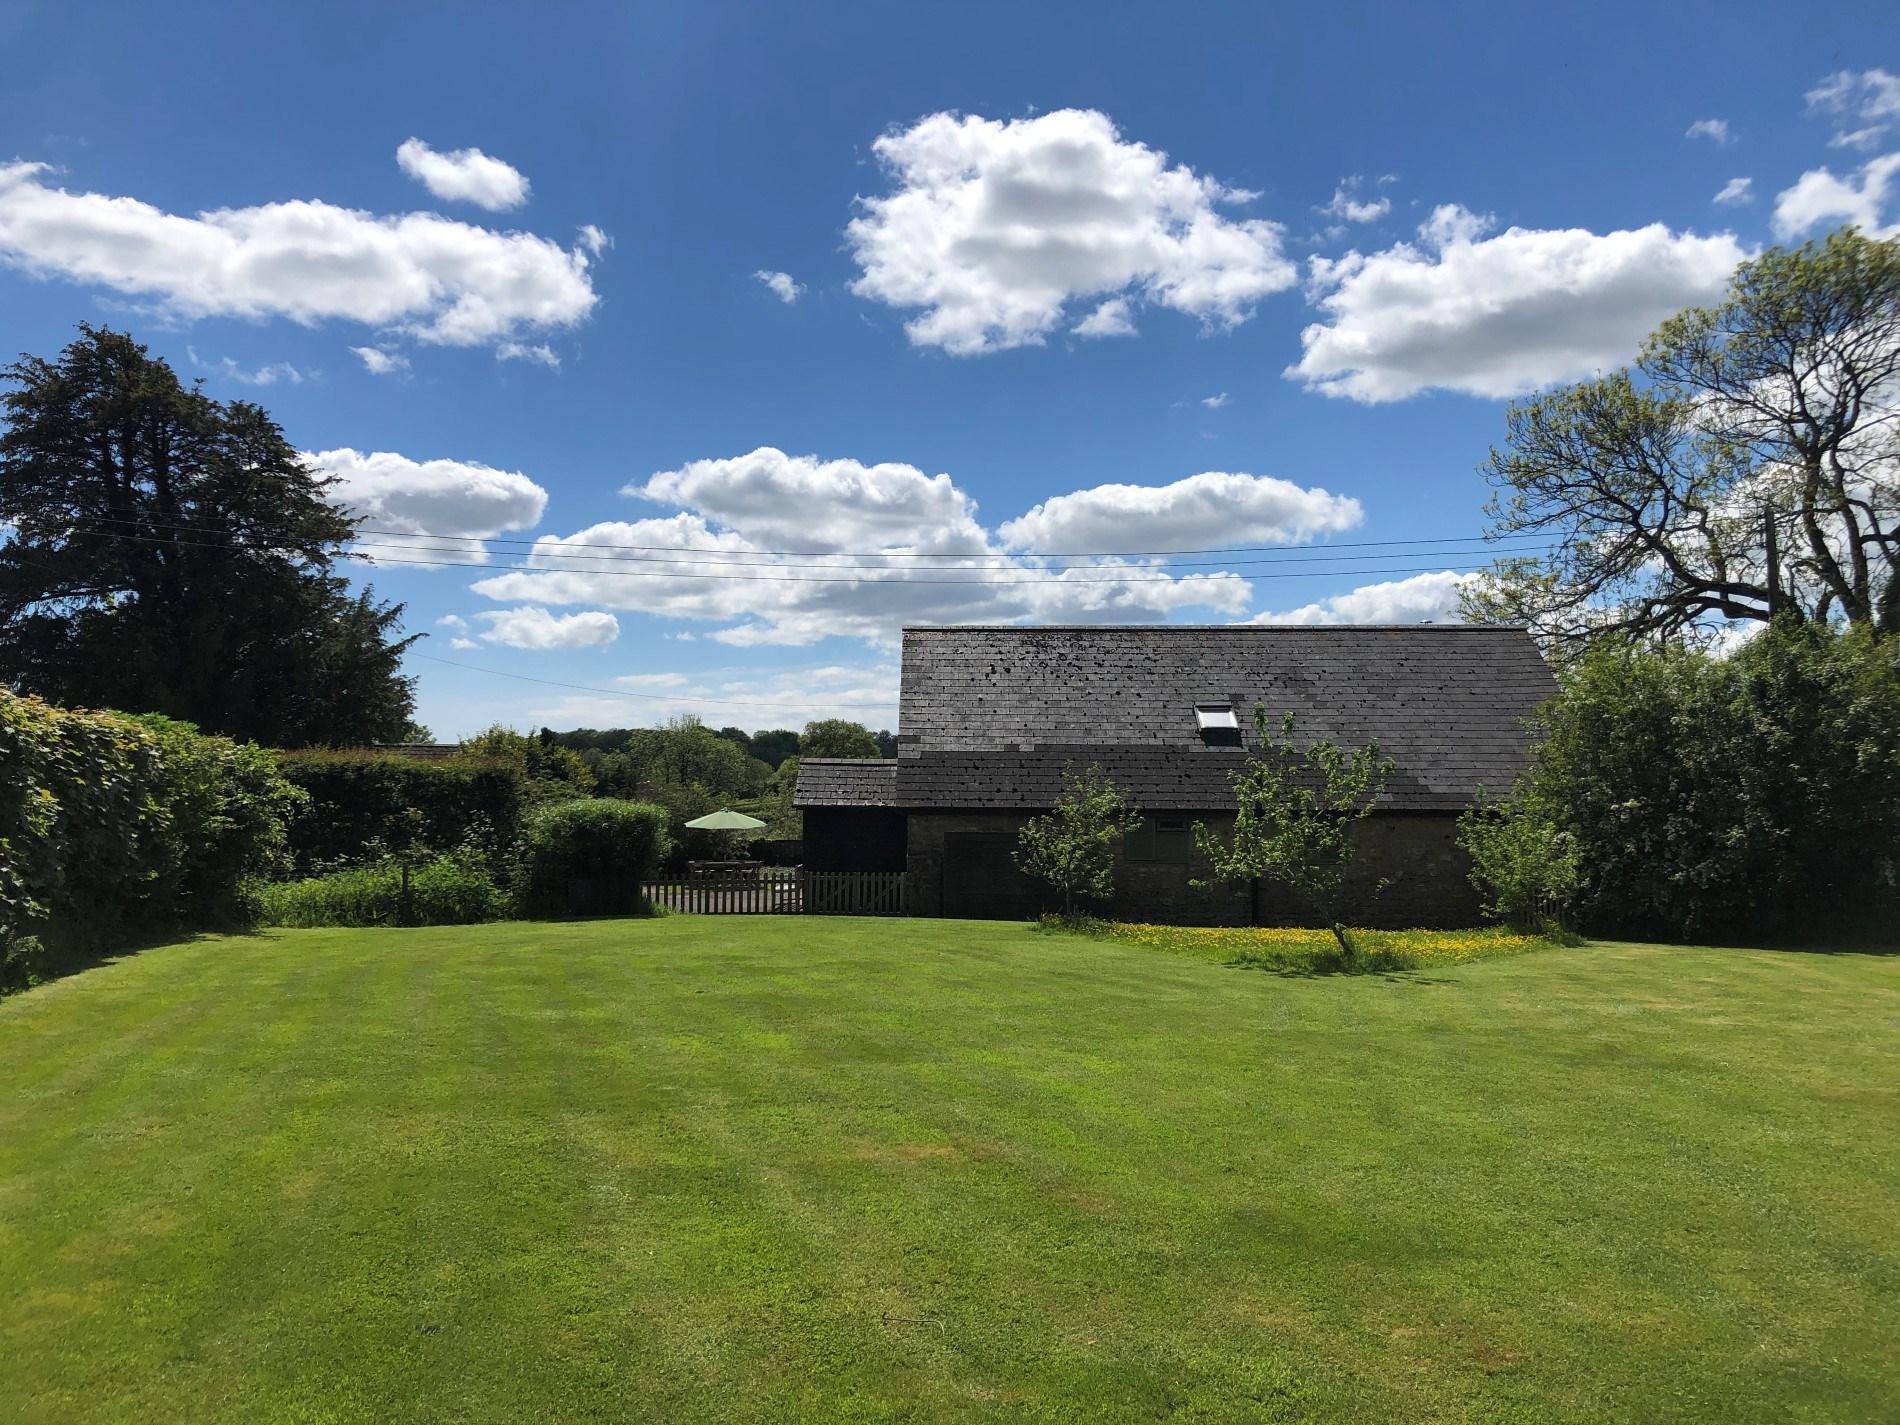 6 Bedroom Barn in Mid and East Devon, Devon